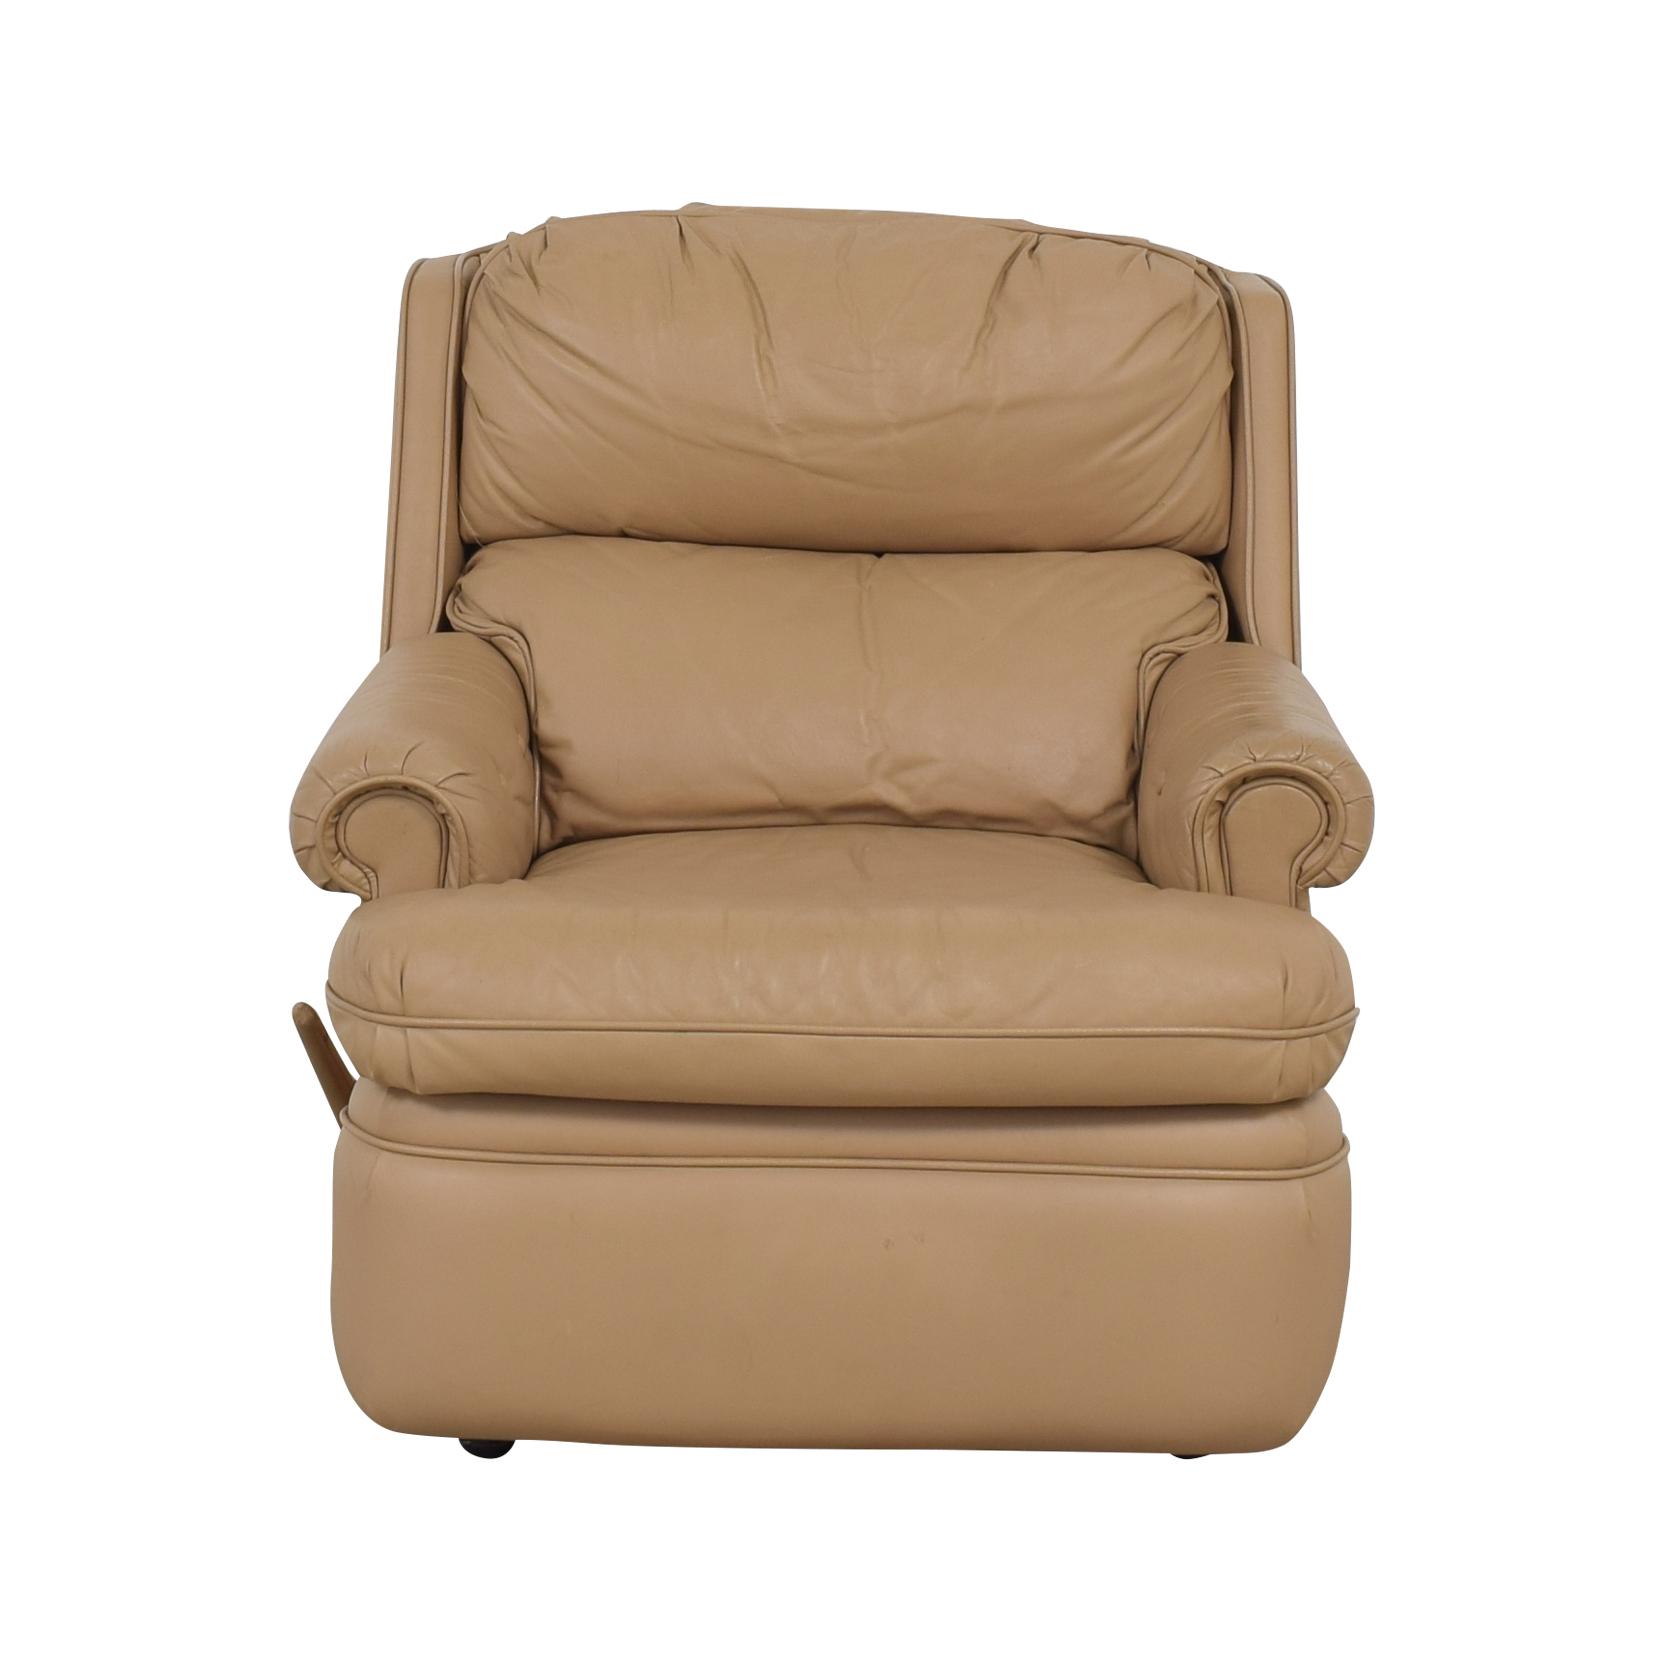 shop Barcalounger Recliner Barcalounger Chairs